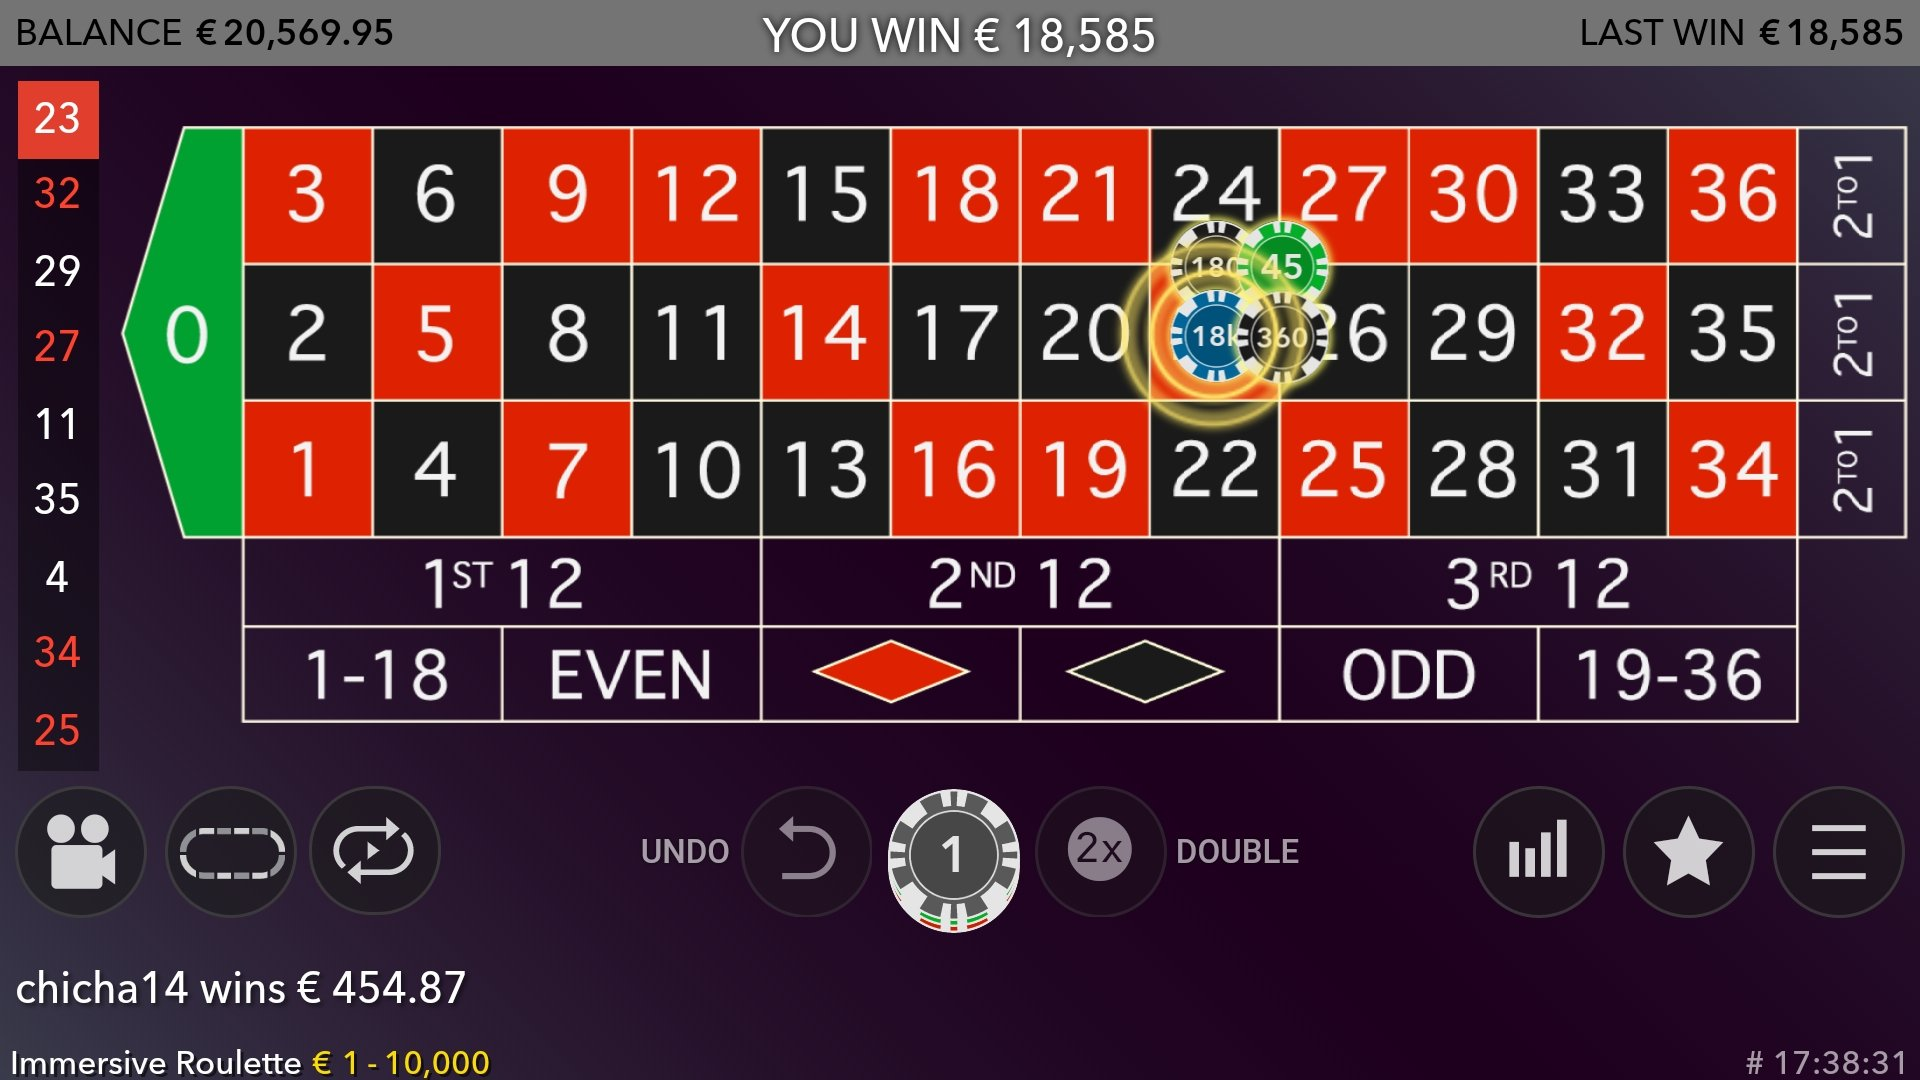 Immersive Roulette Roulette The Gambling Community